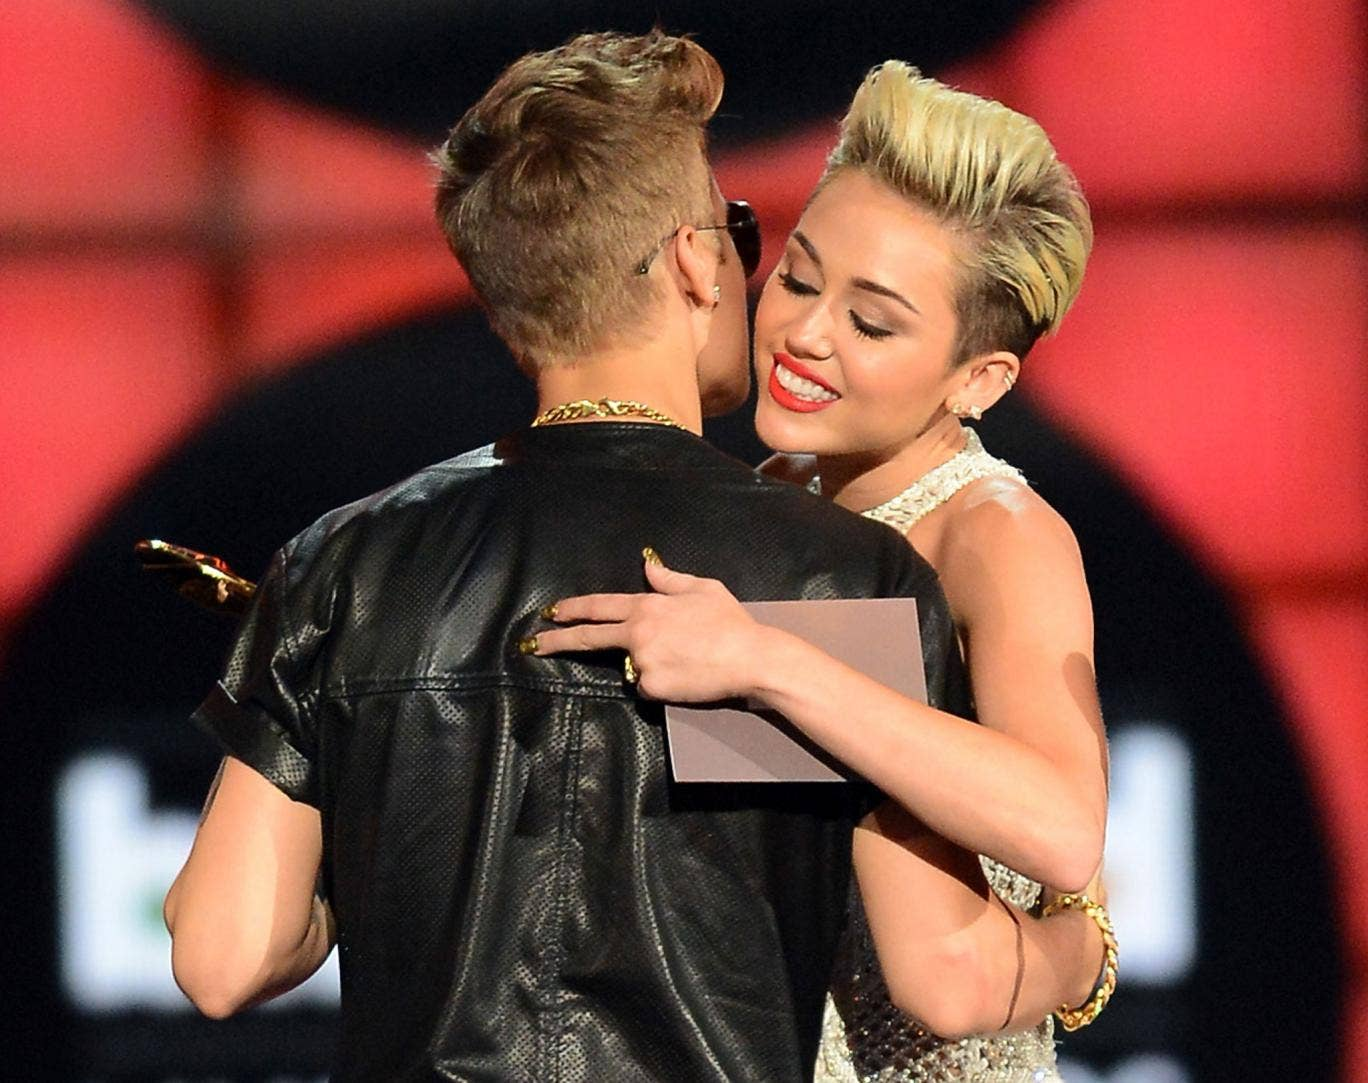 Miley Cyrus congratulates Justin Bieber at the Billboard Awards